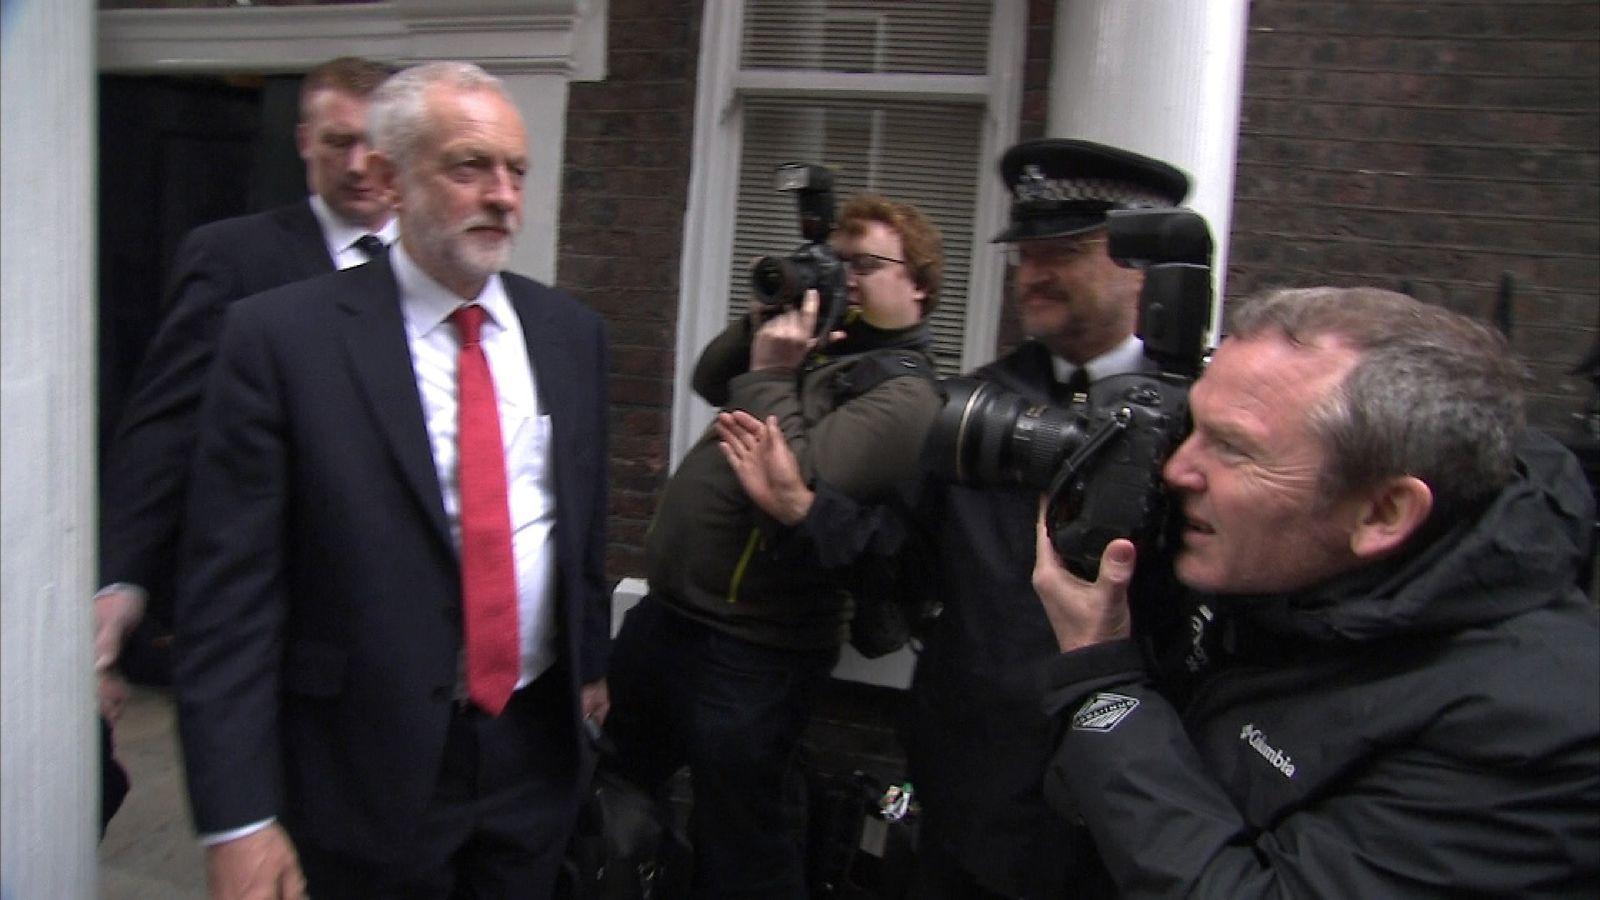 Jeremy Corbyn leaving Chatham House